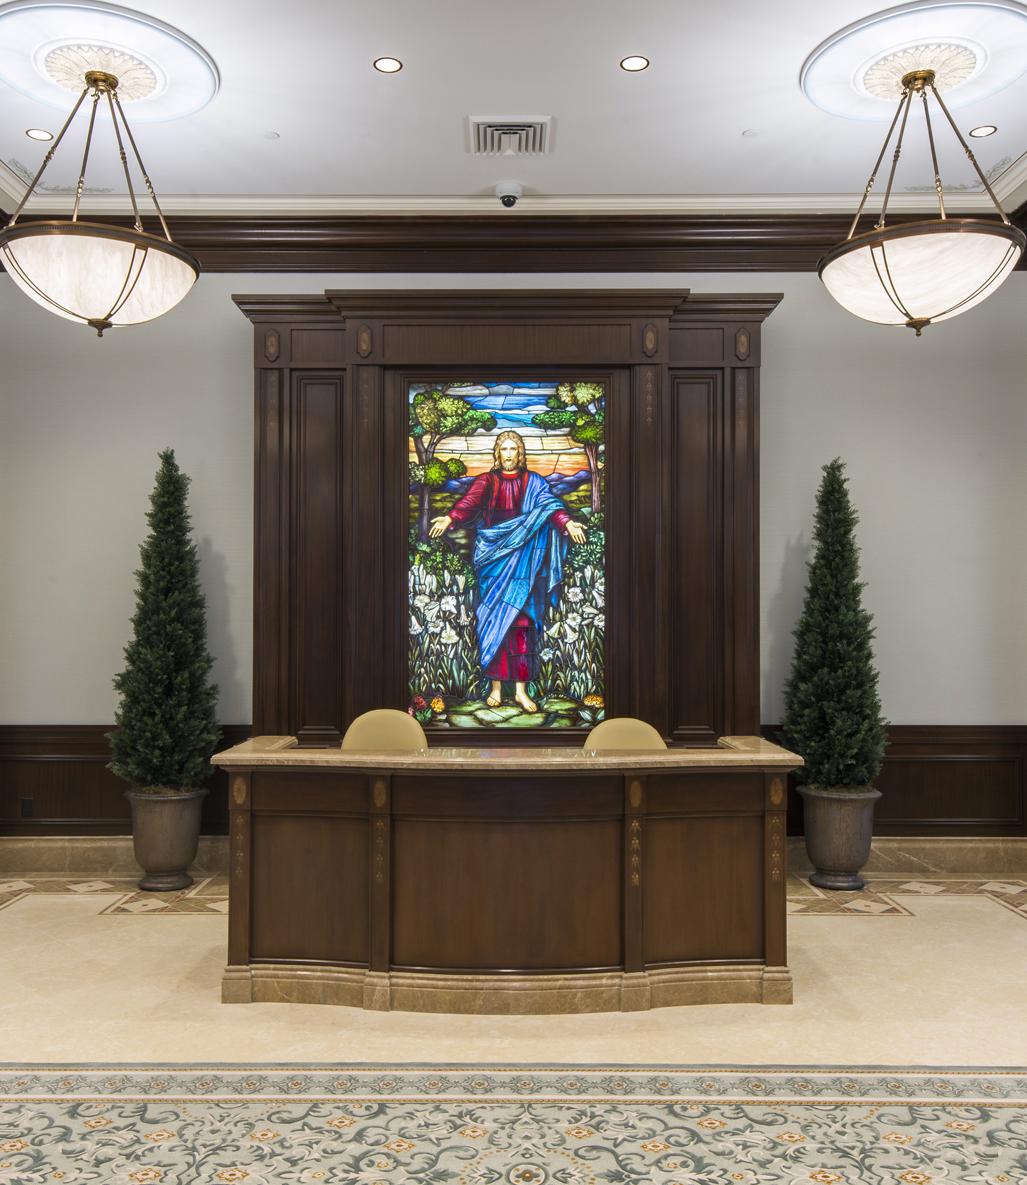 City Glass Windows : Even for a non mormon touring the new temple in cedar